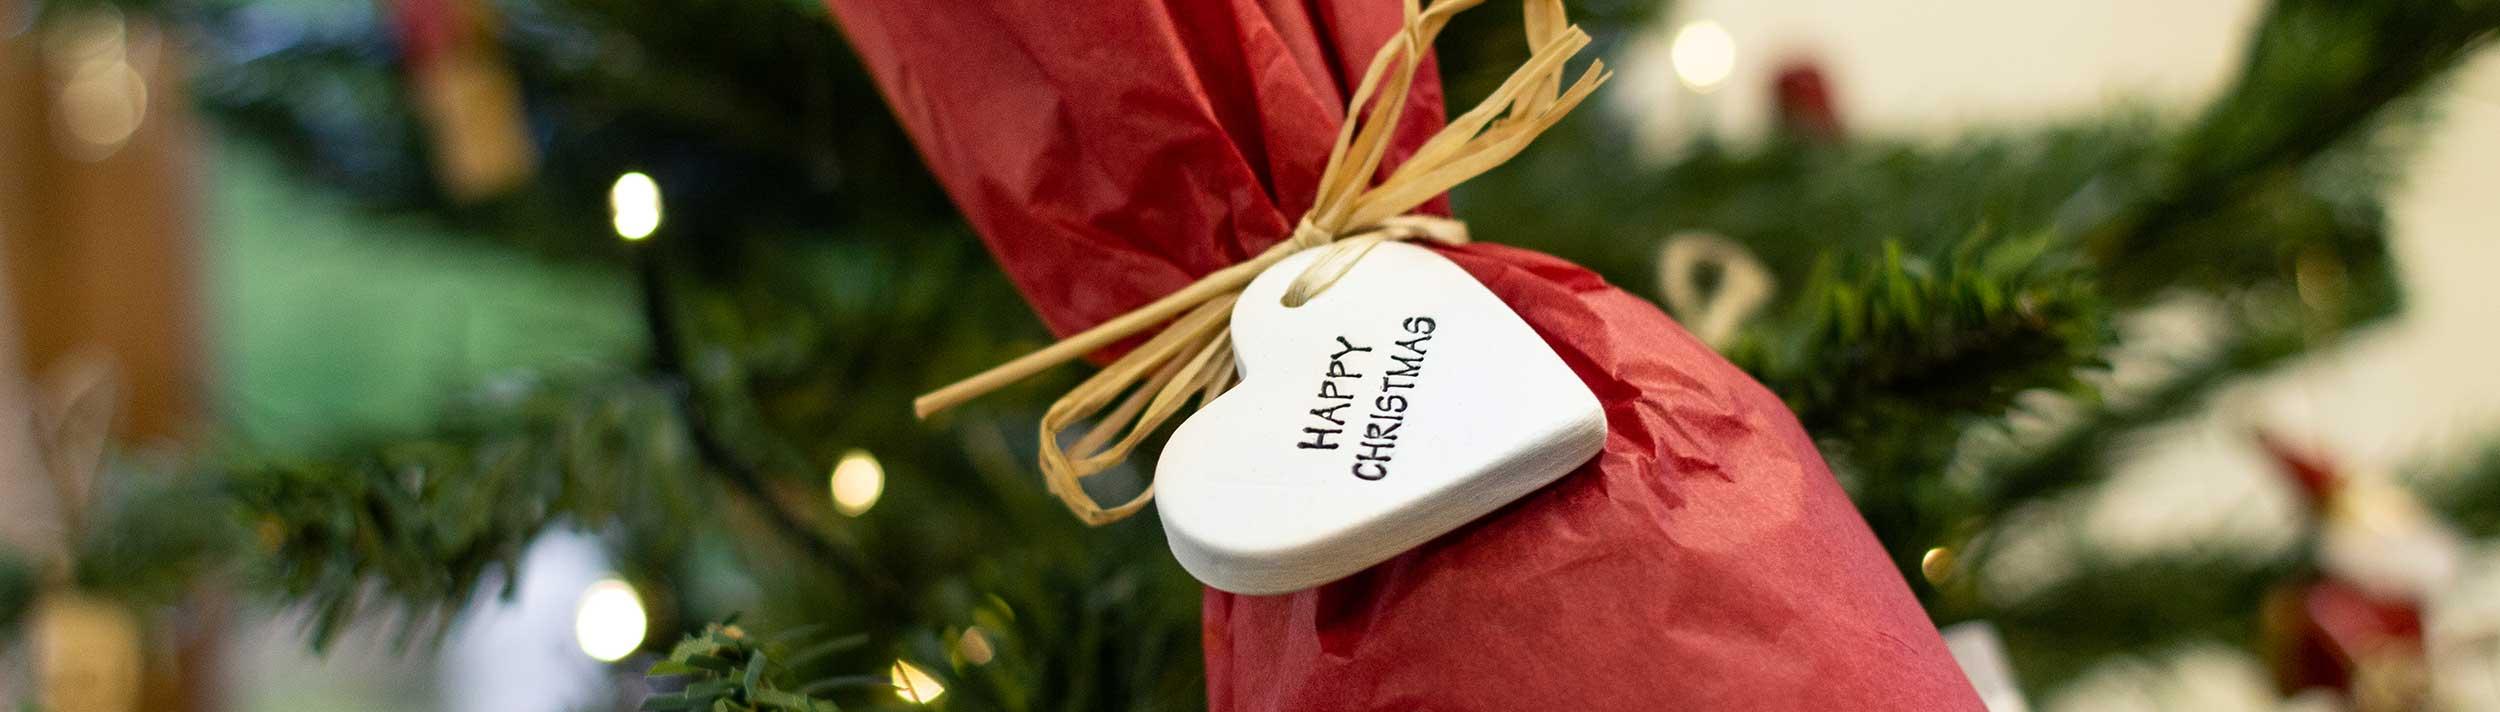 Buy local this Christmas at Alder Vineyard